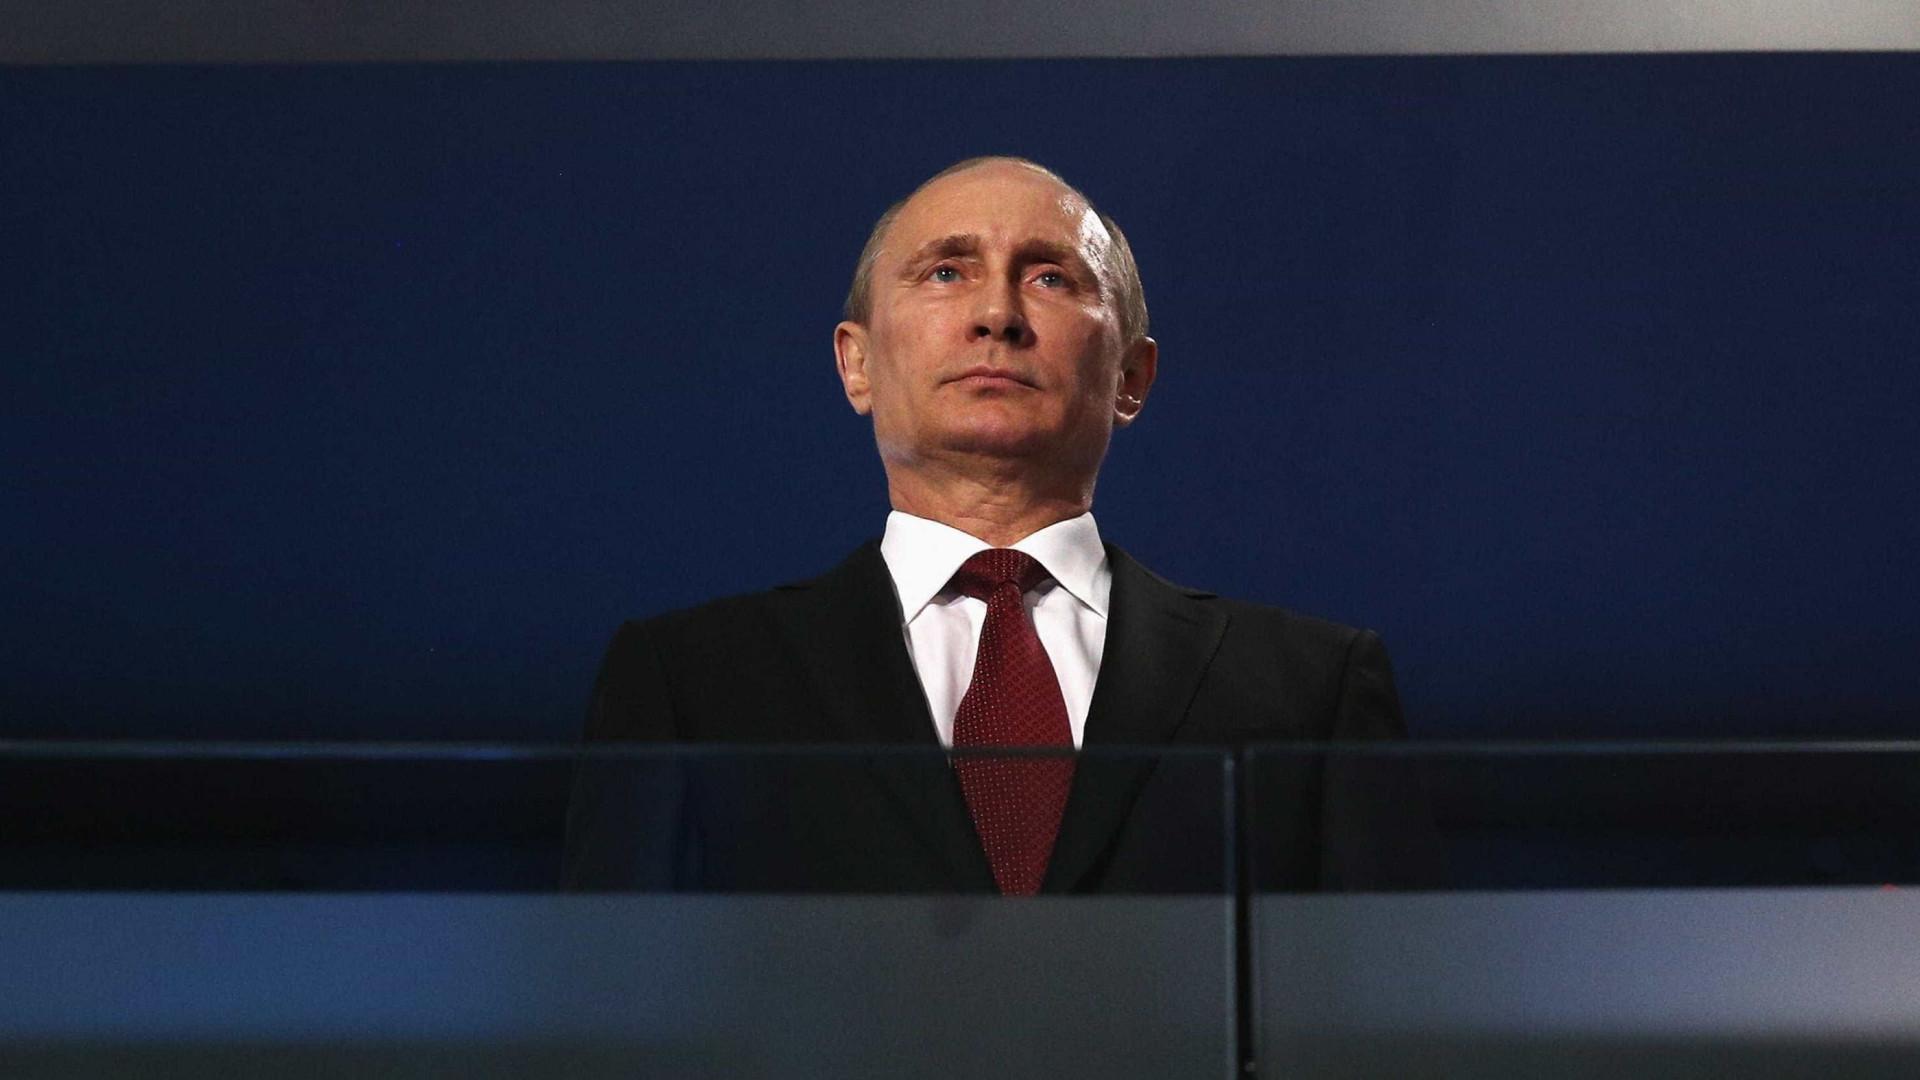 Acesso anónimo à internet proibido na Rússia